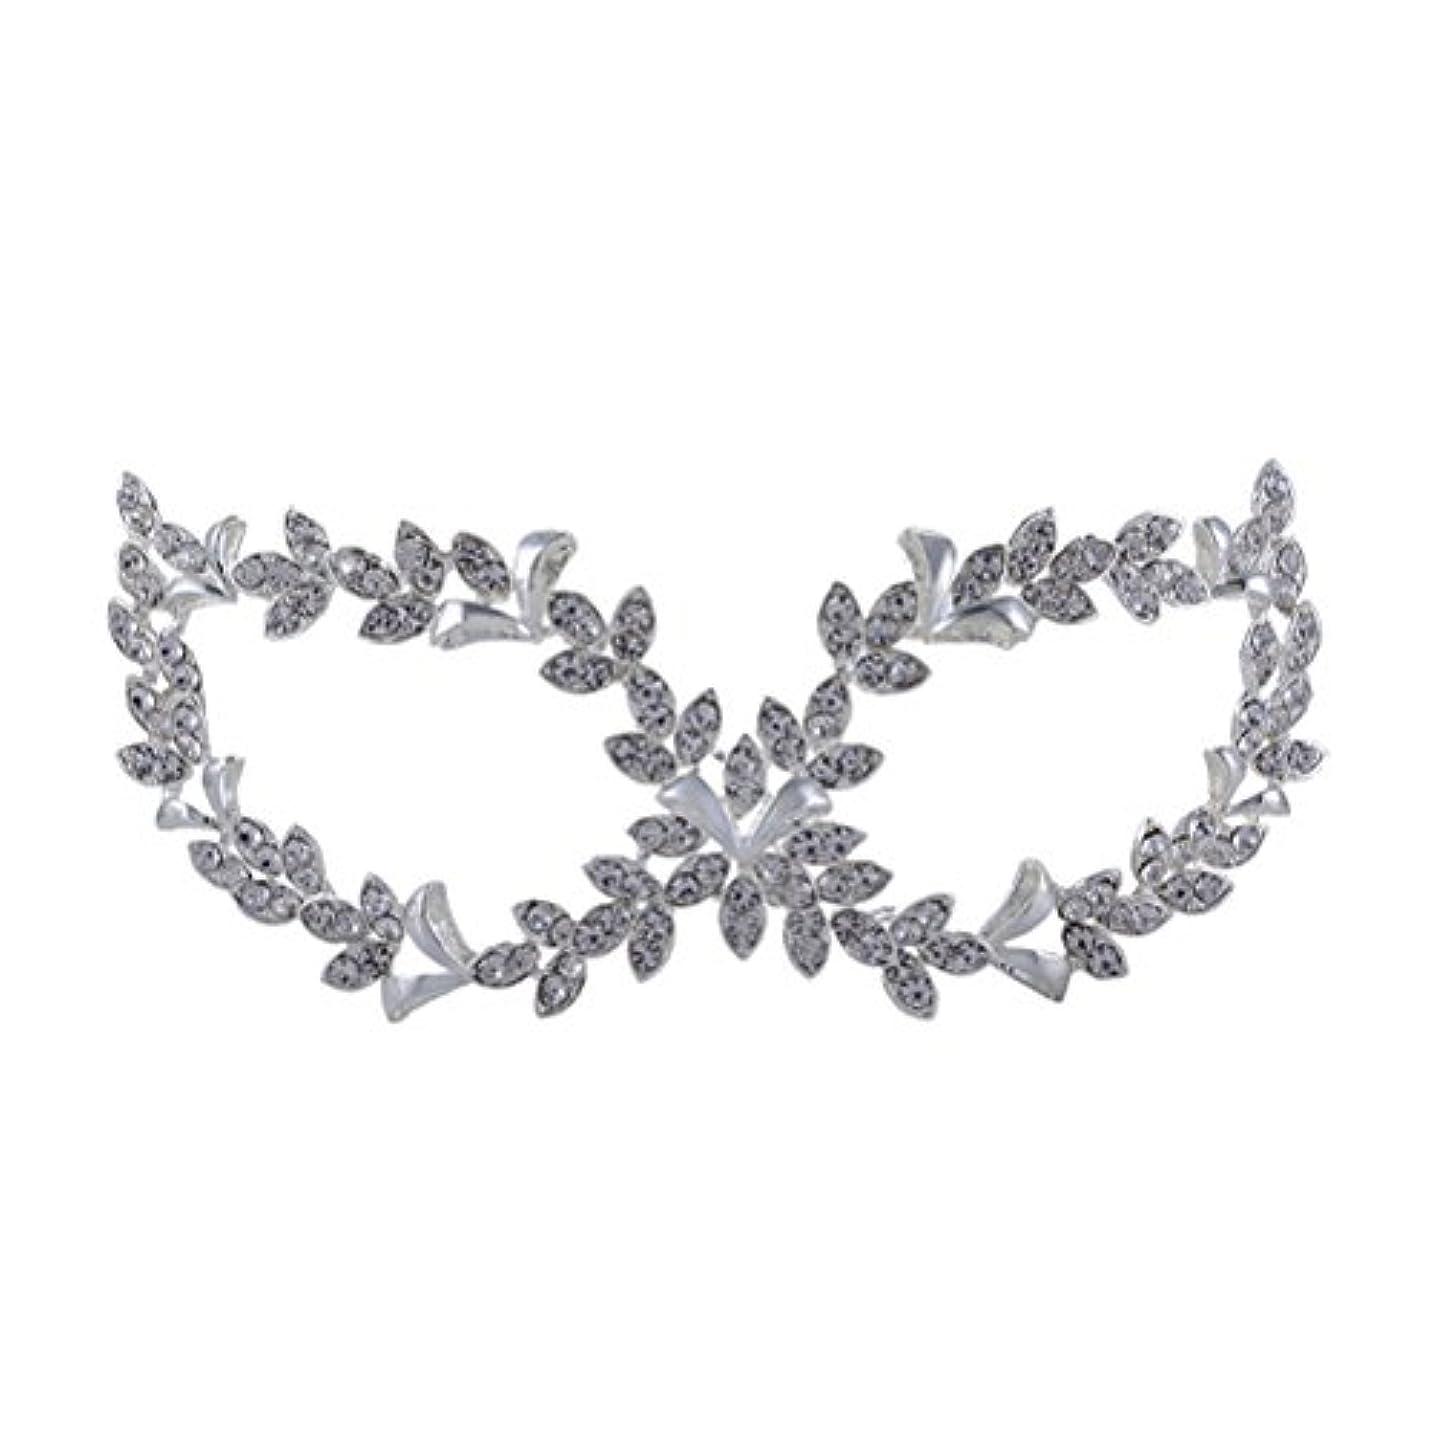 一目協定少数ROSENICE 仮面舞踏会マスク 調節可能